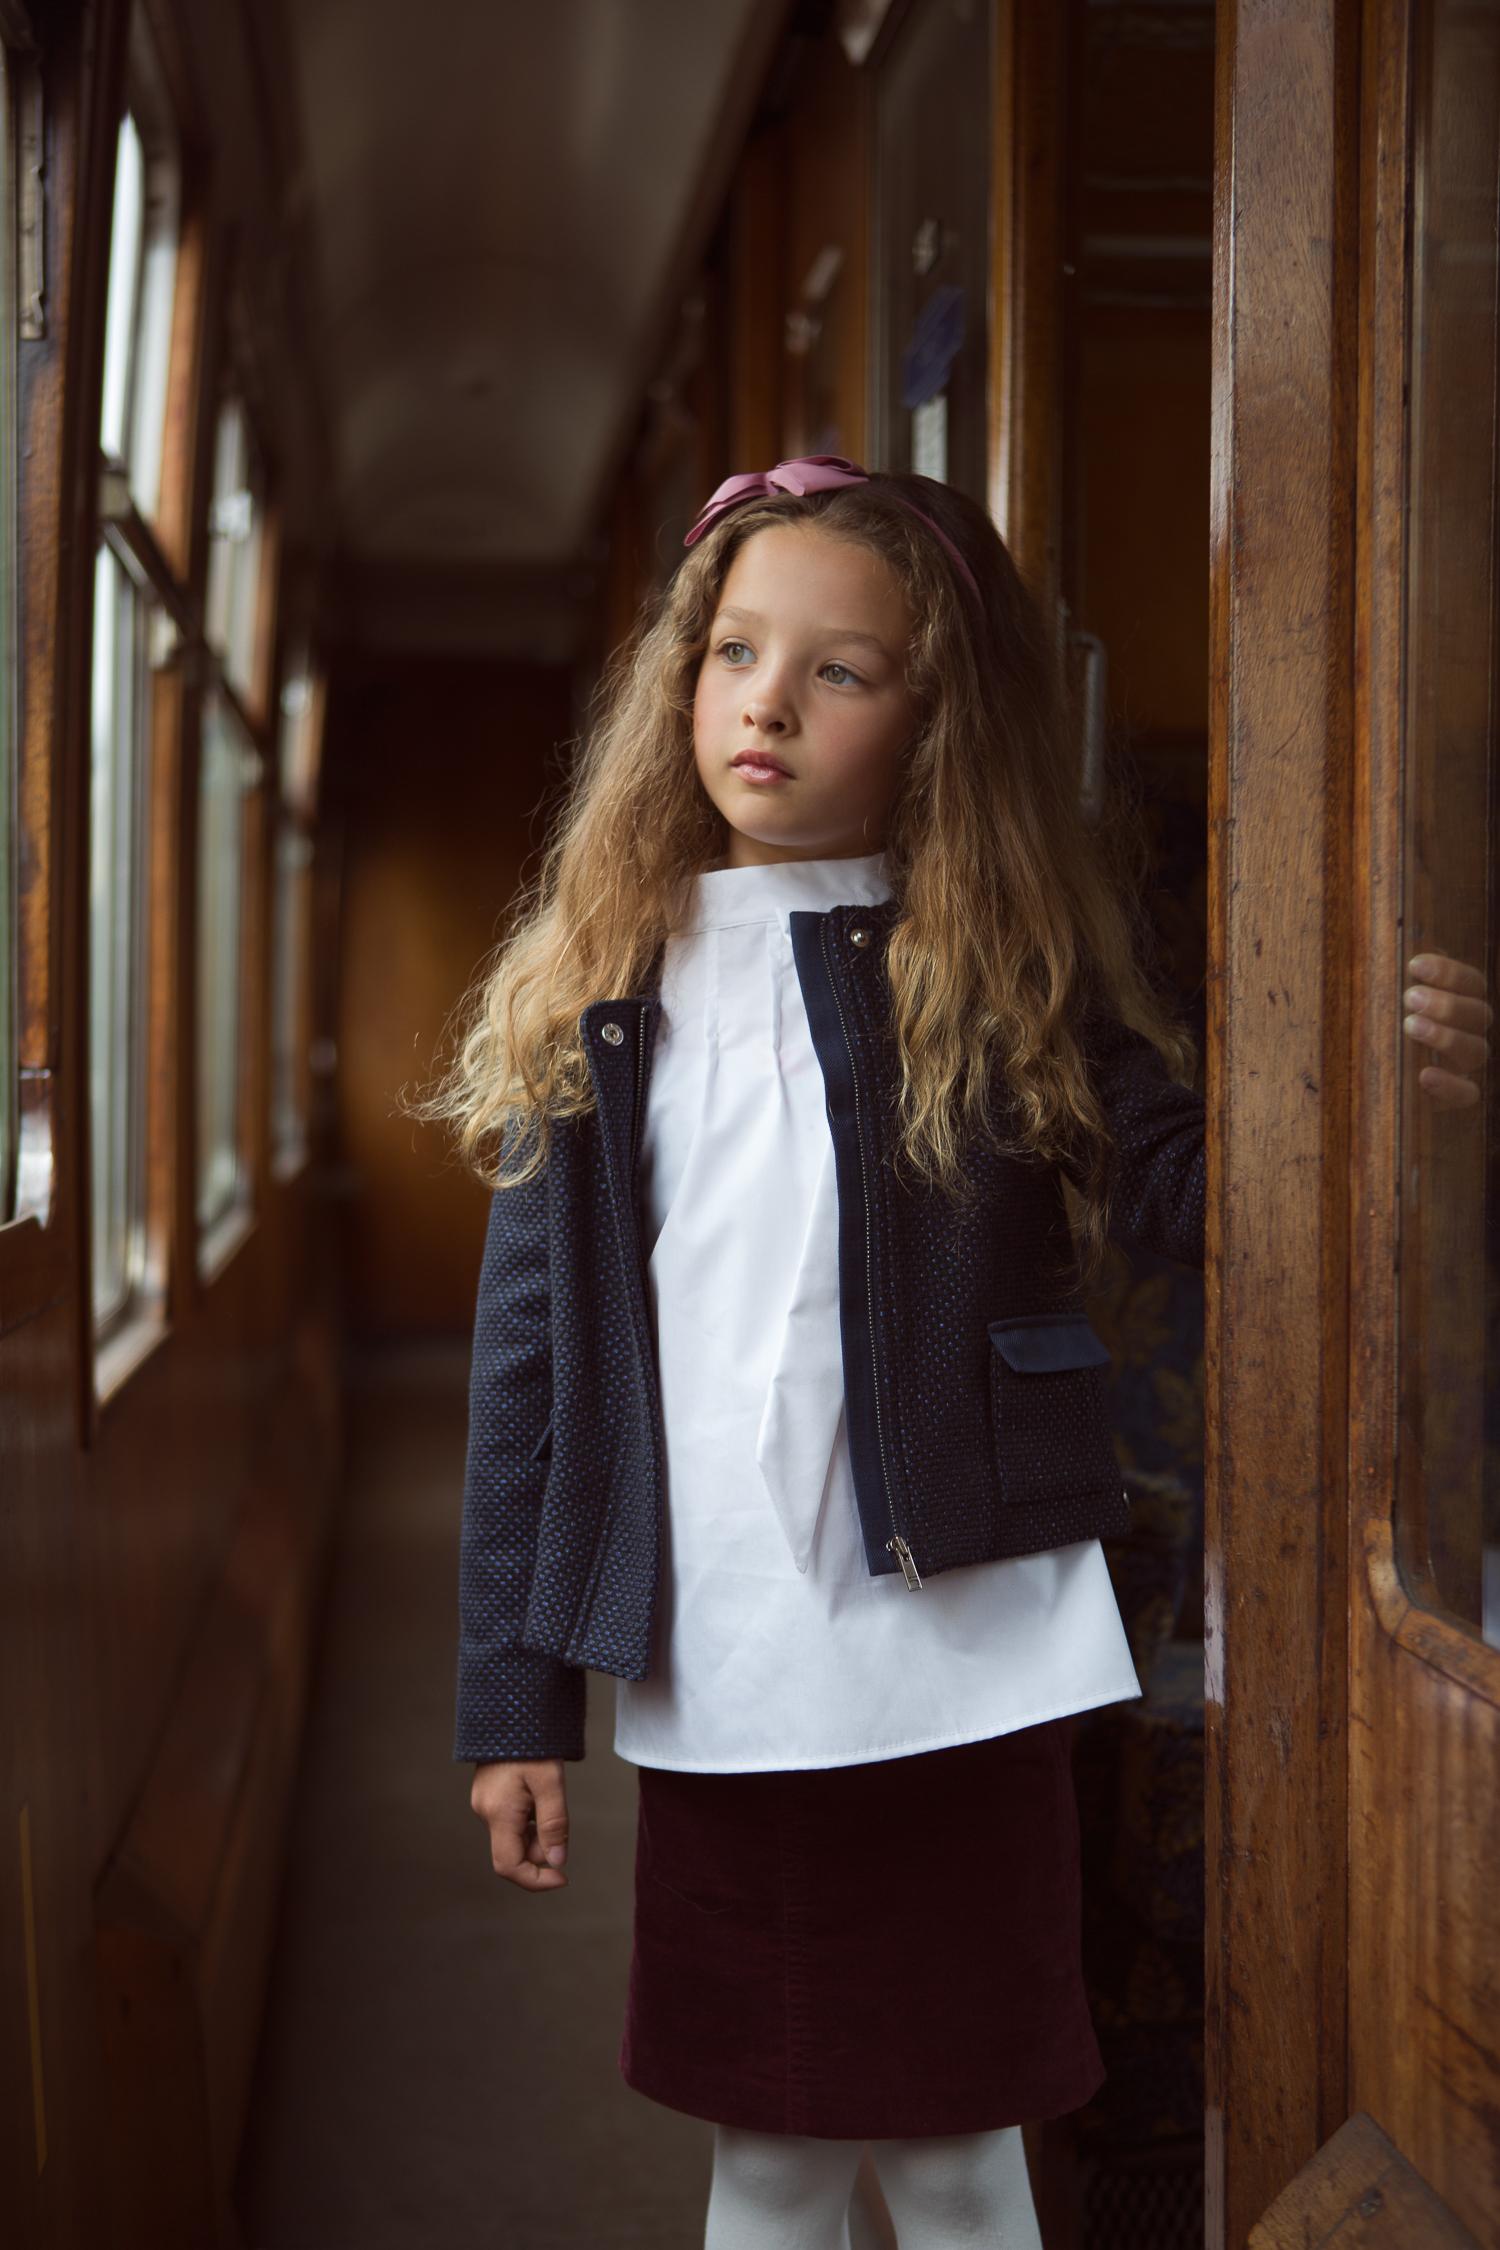 childrens portrait photographer--17.jpg